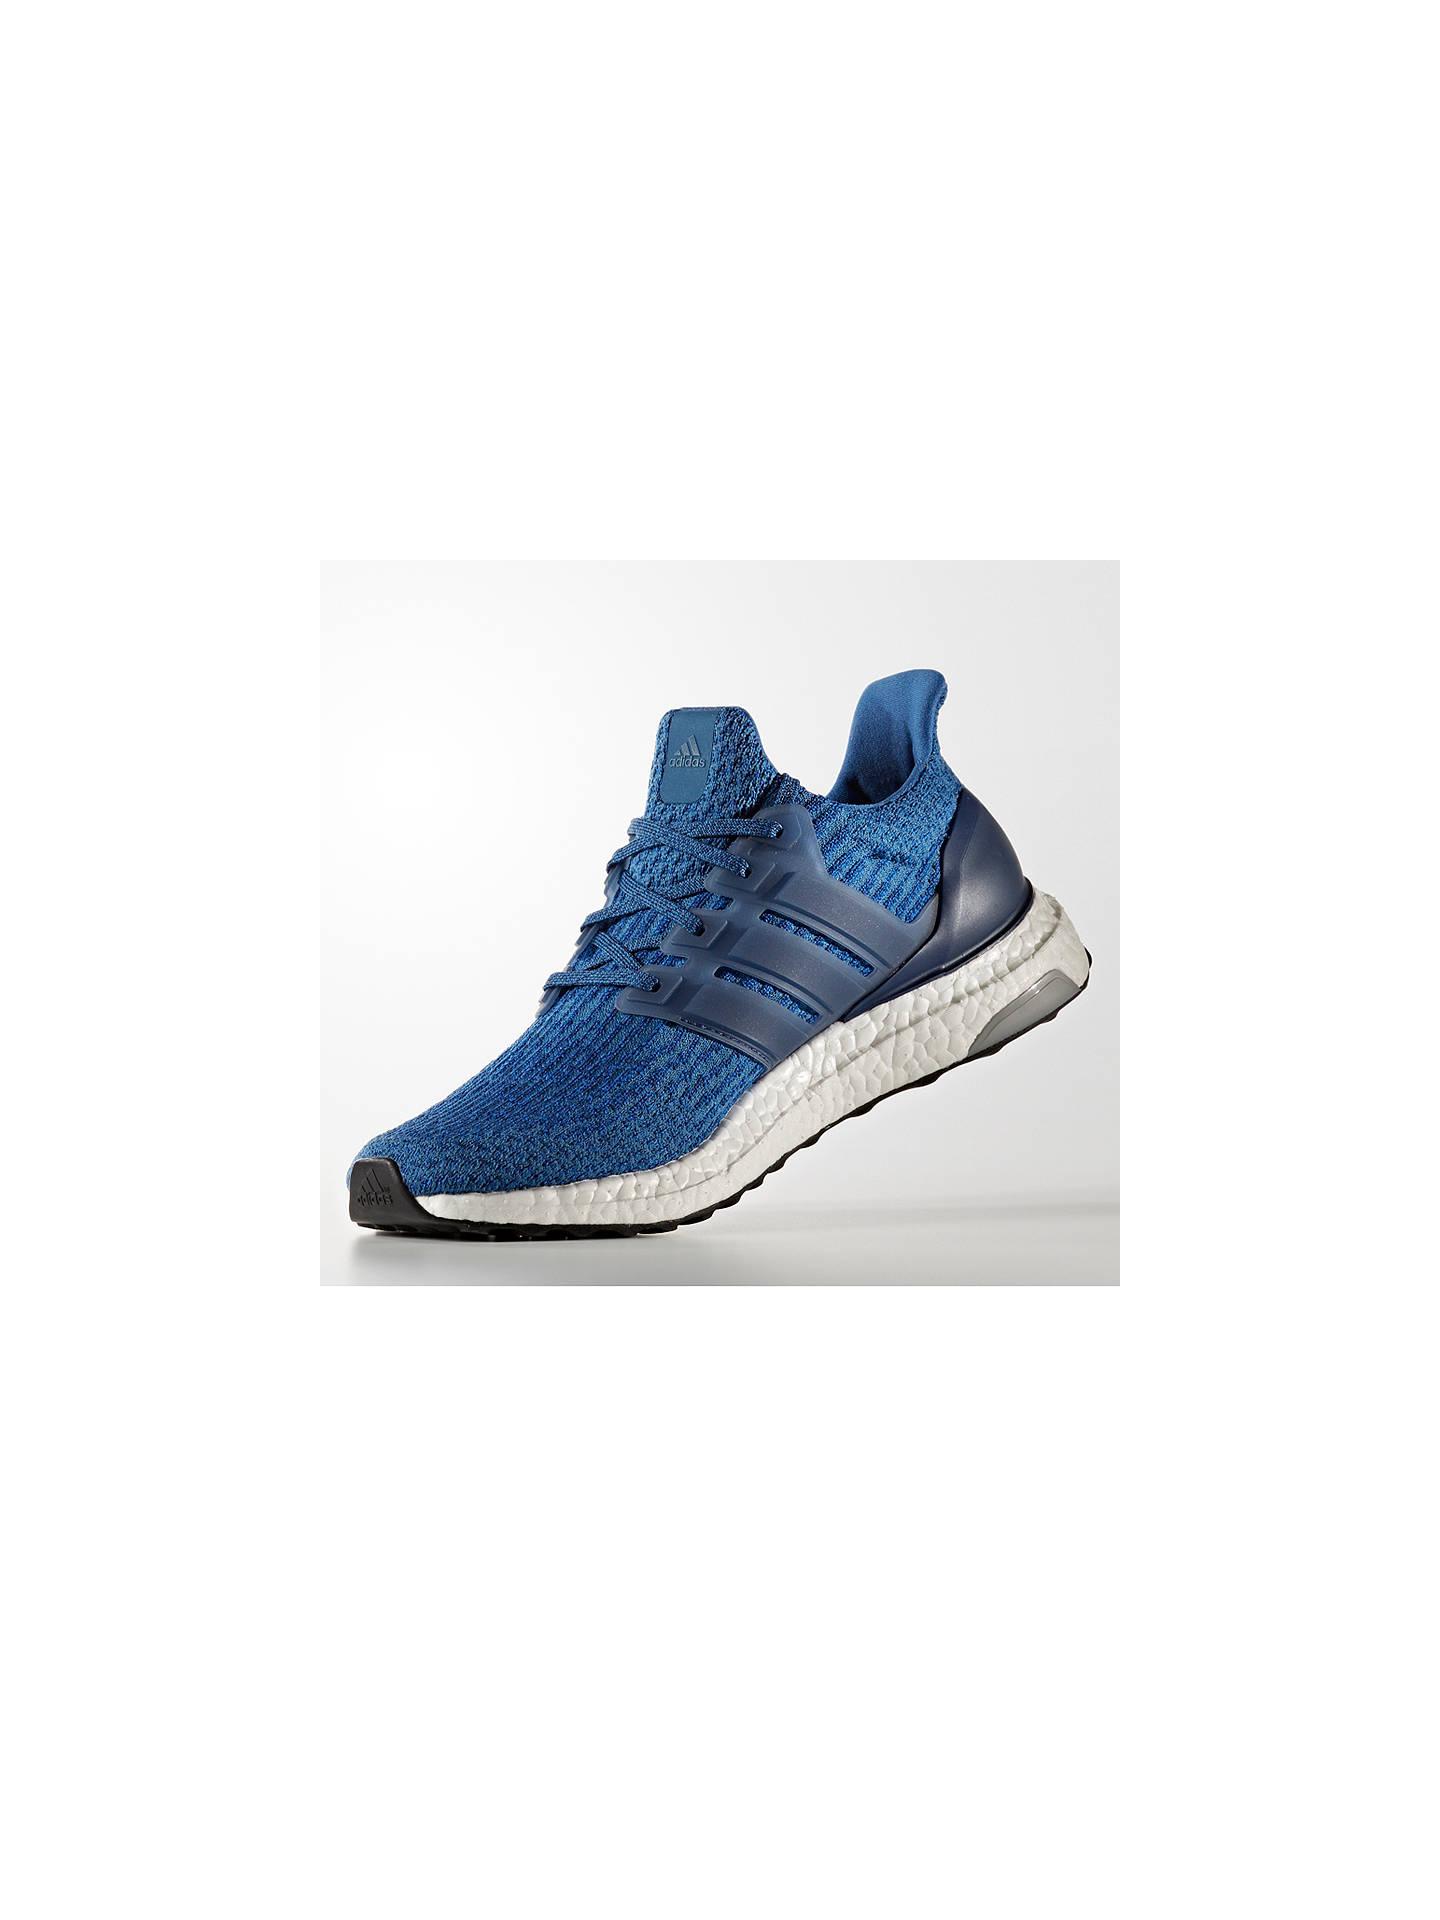 9a1a78e1fbc19 ... Buy adidas Ultra Boost Men s Running Shoes